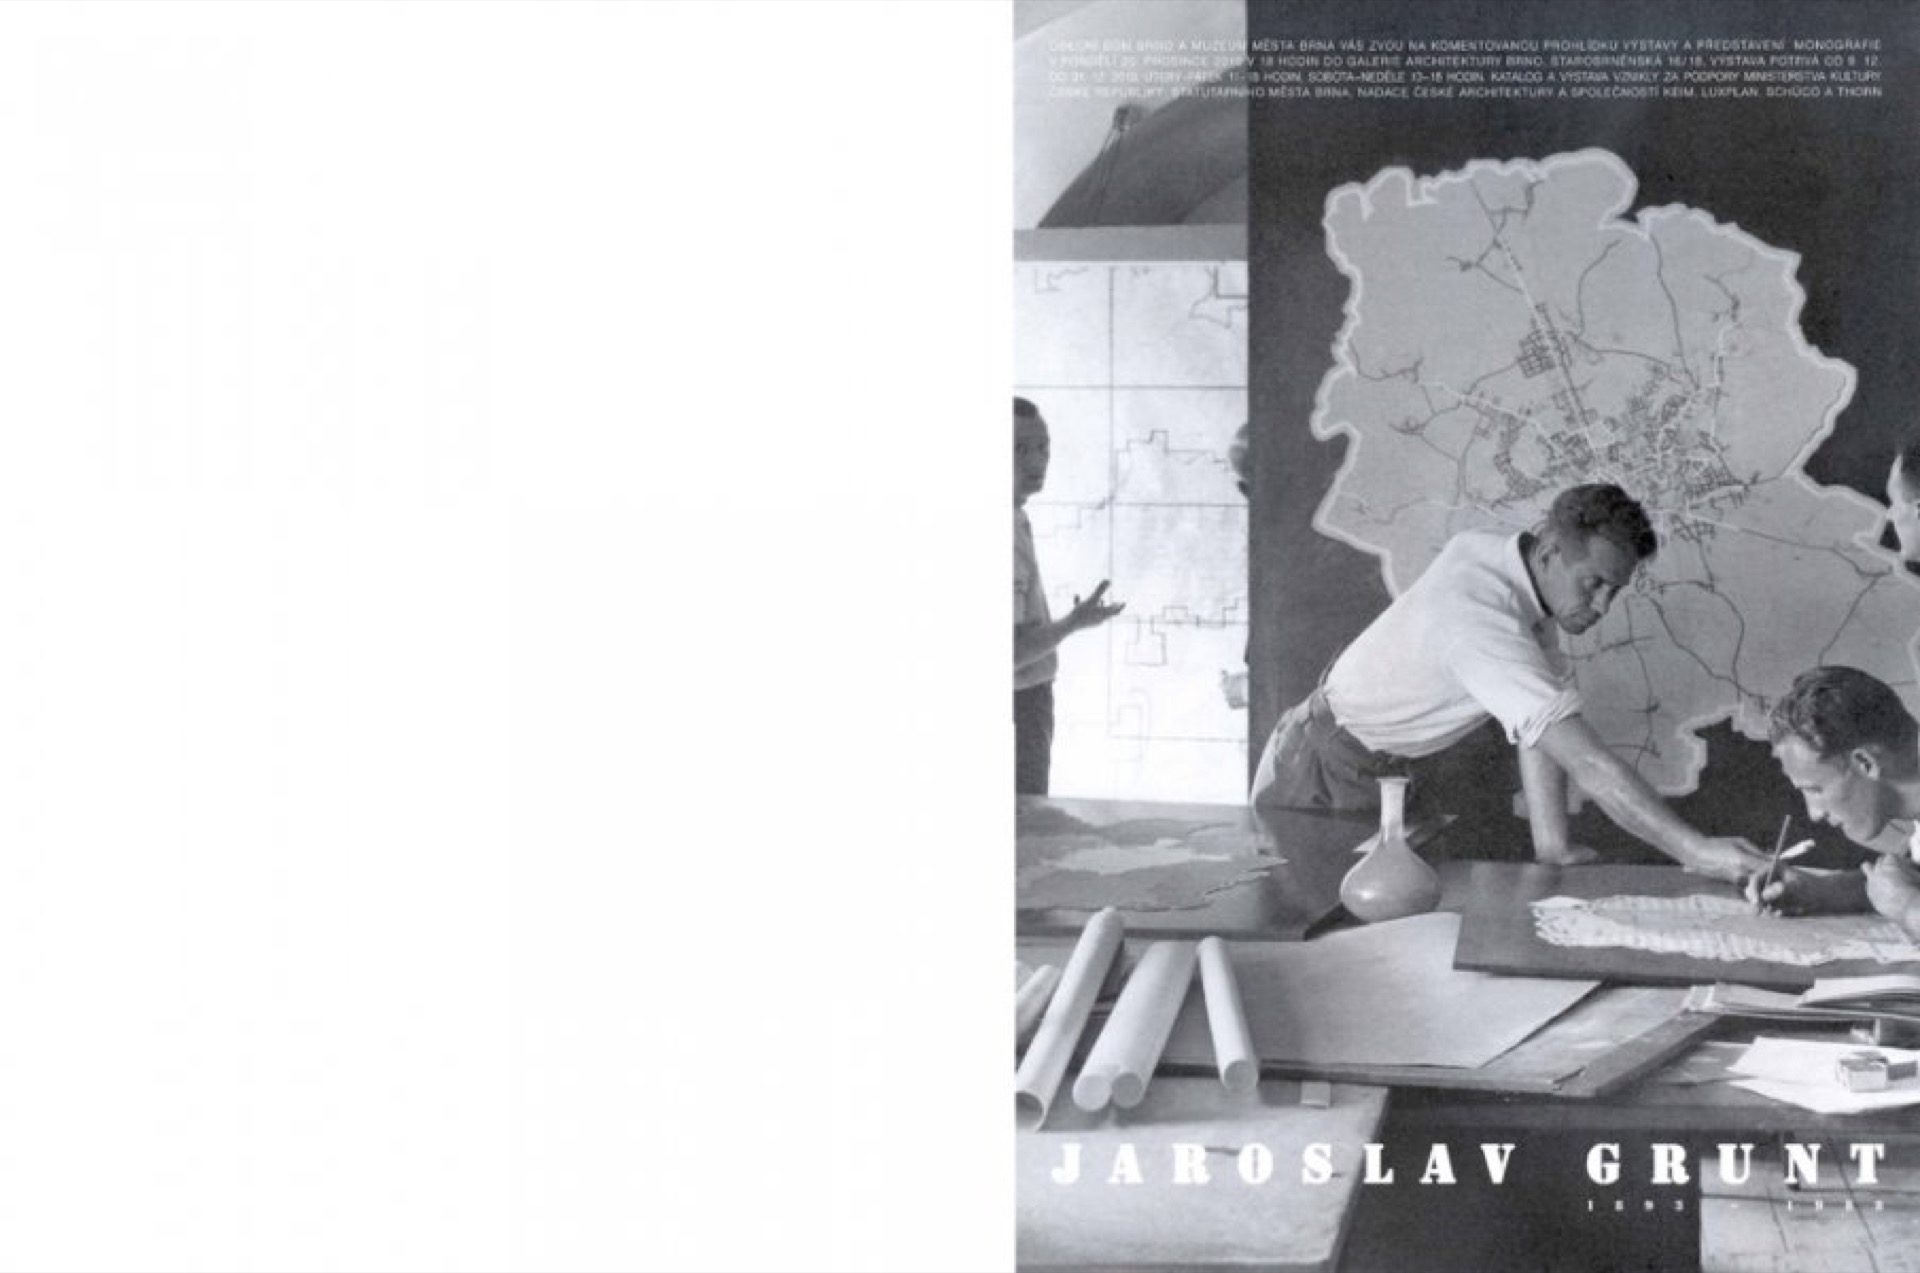 Další zbílých monografií, tentokrát Jaroslav Grunt